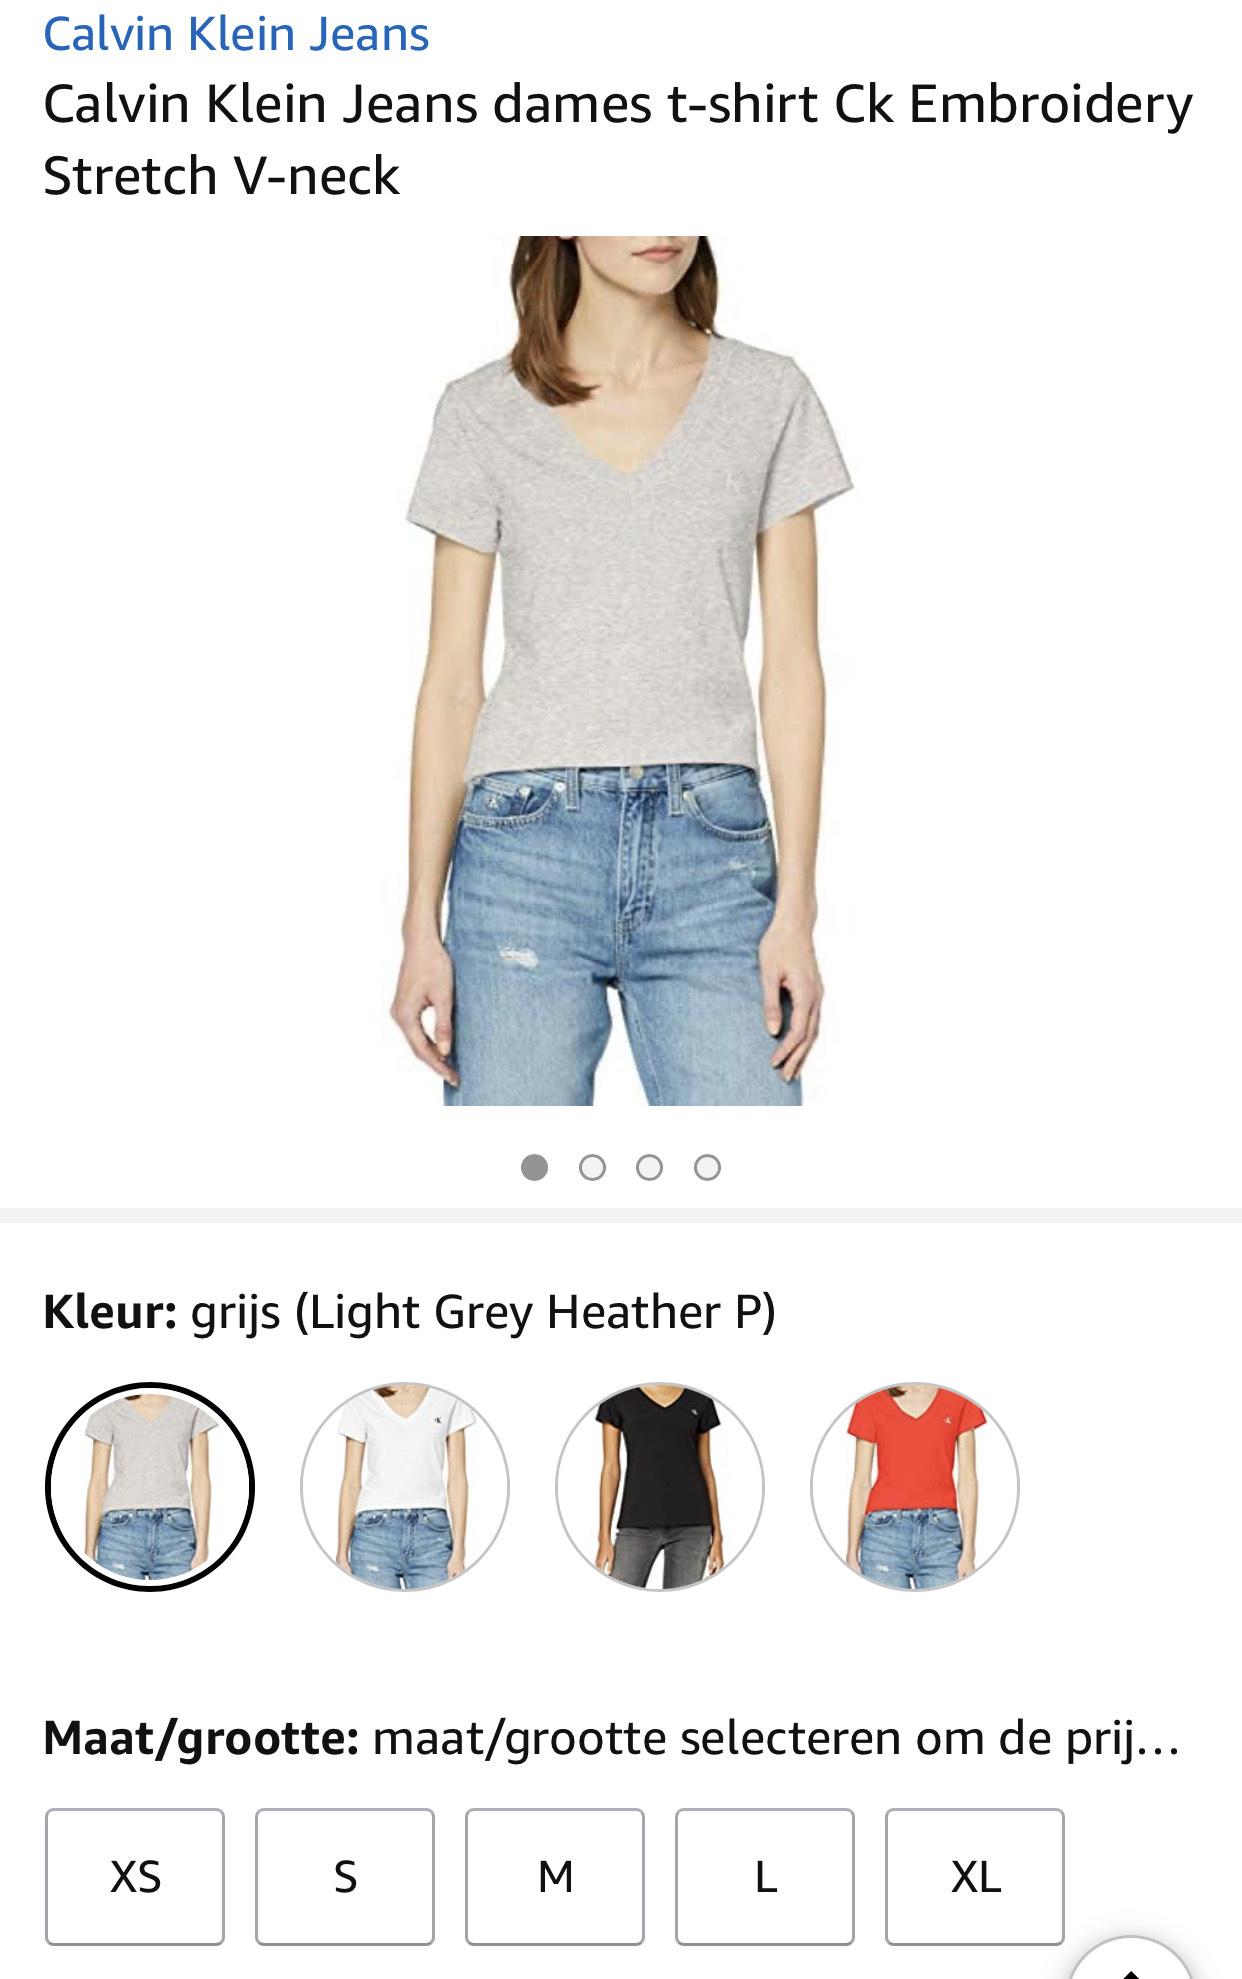 Calvin Klein Jeans dames t-shirt vanaf €12,32